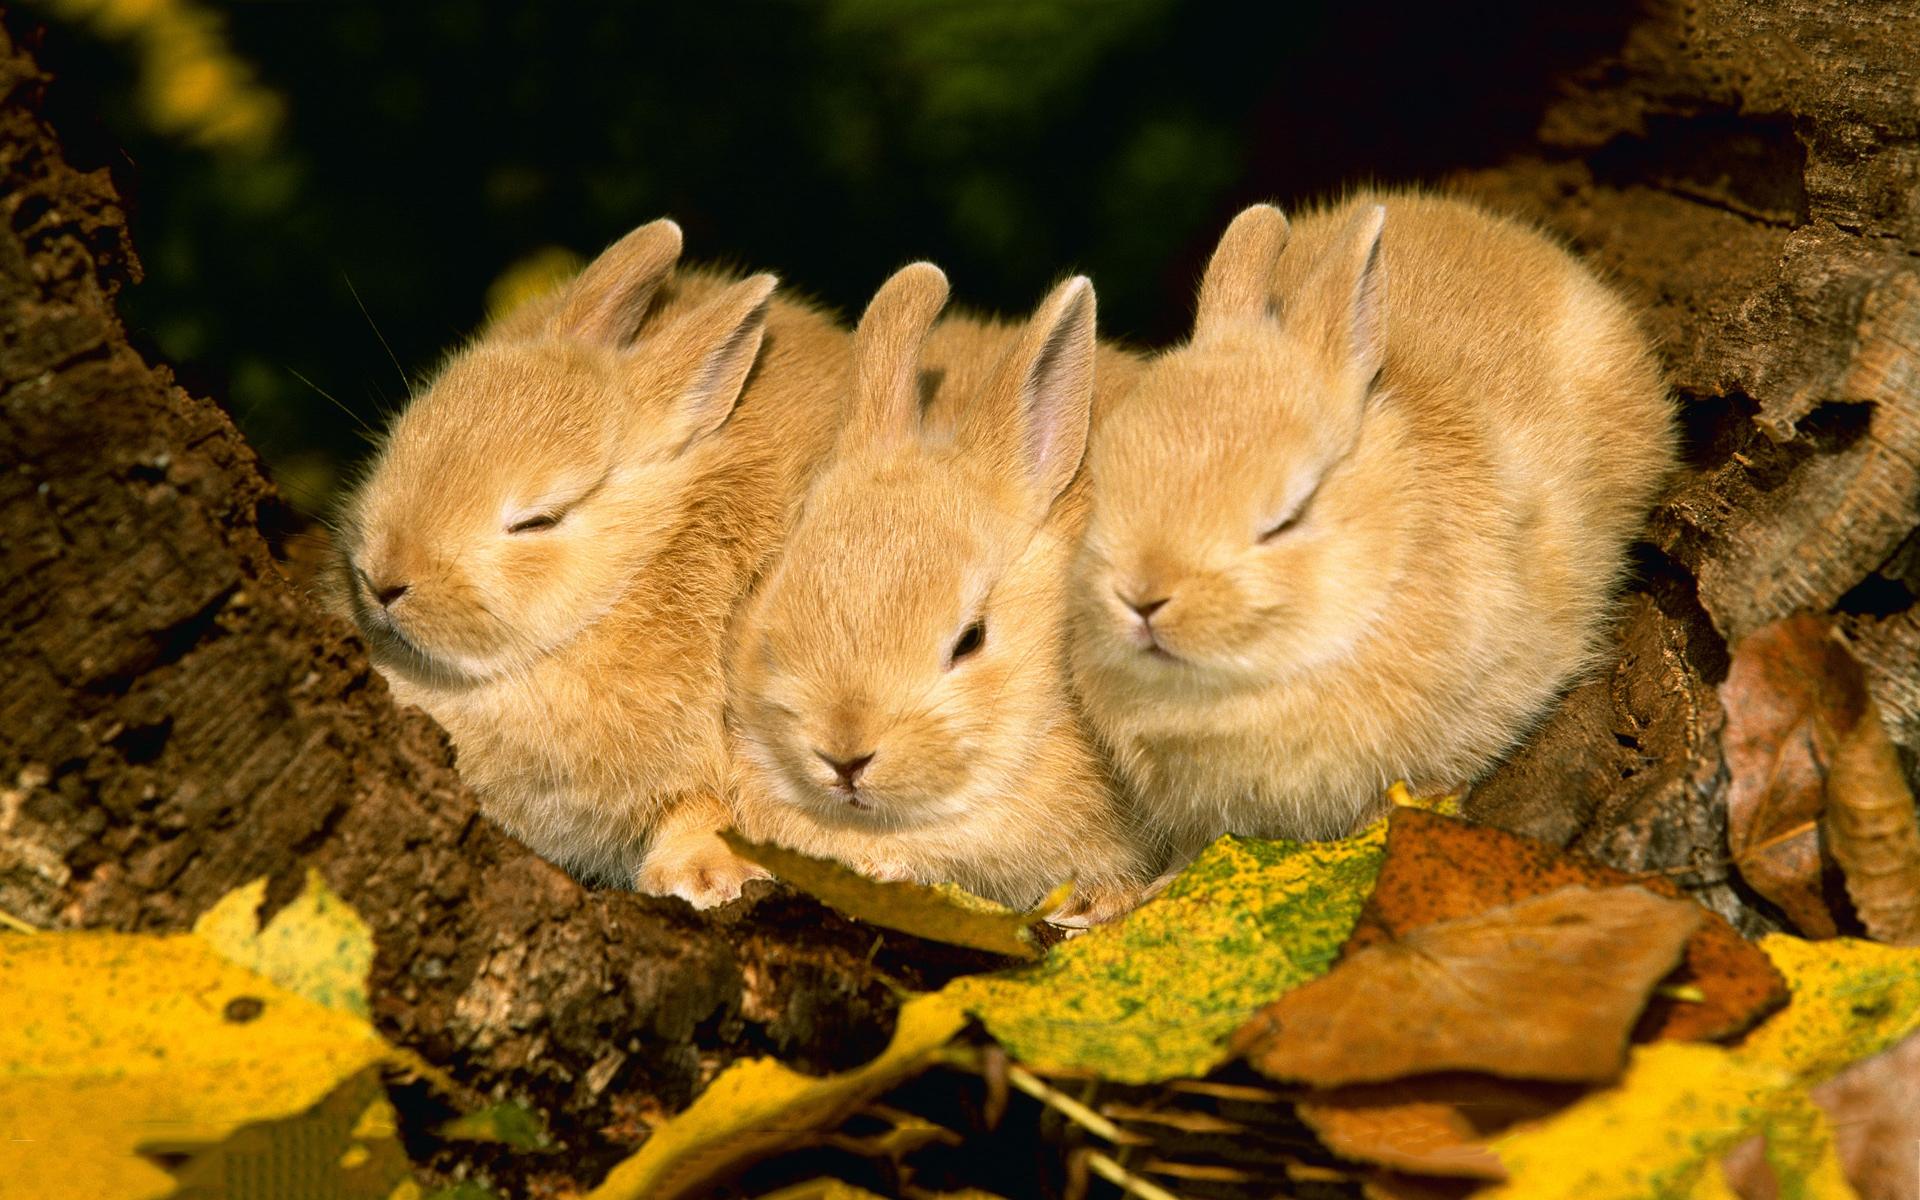 bunnies sleeping cute wallpaper